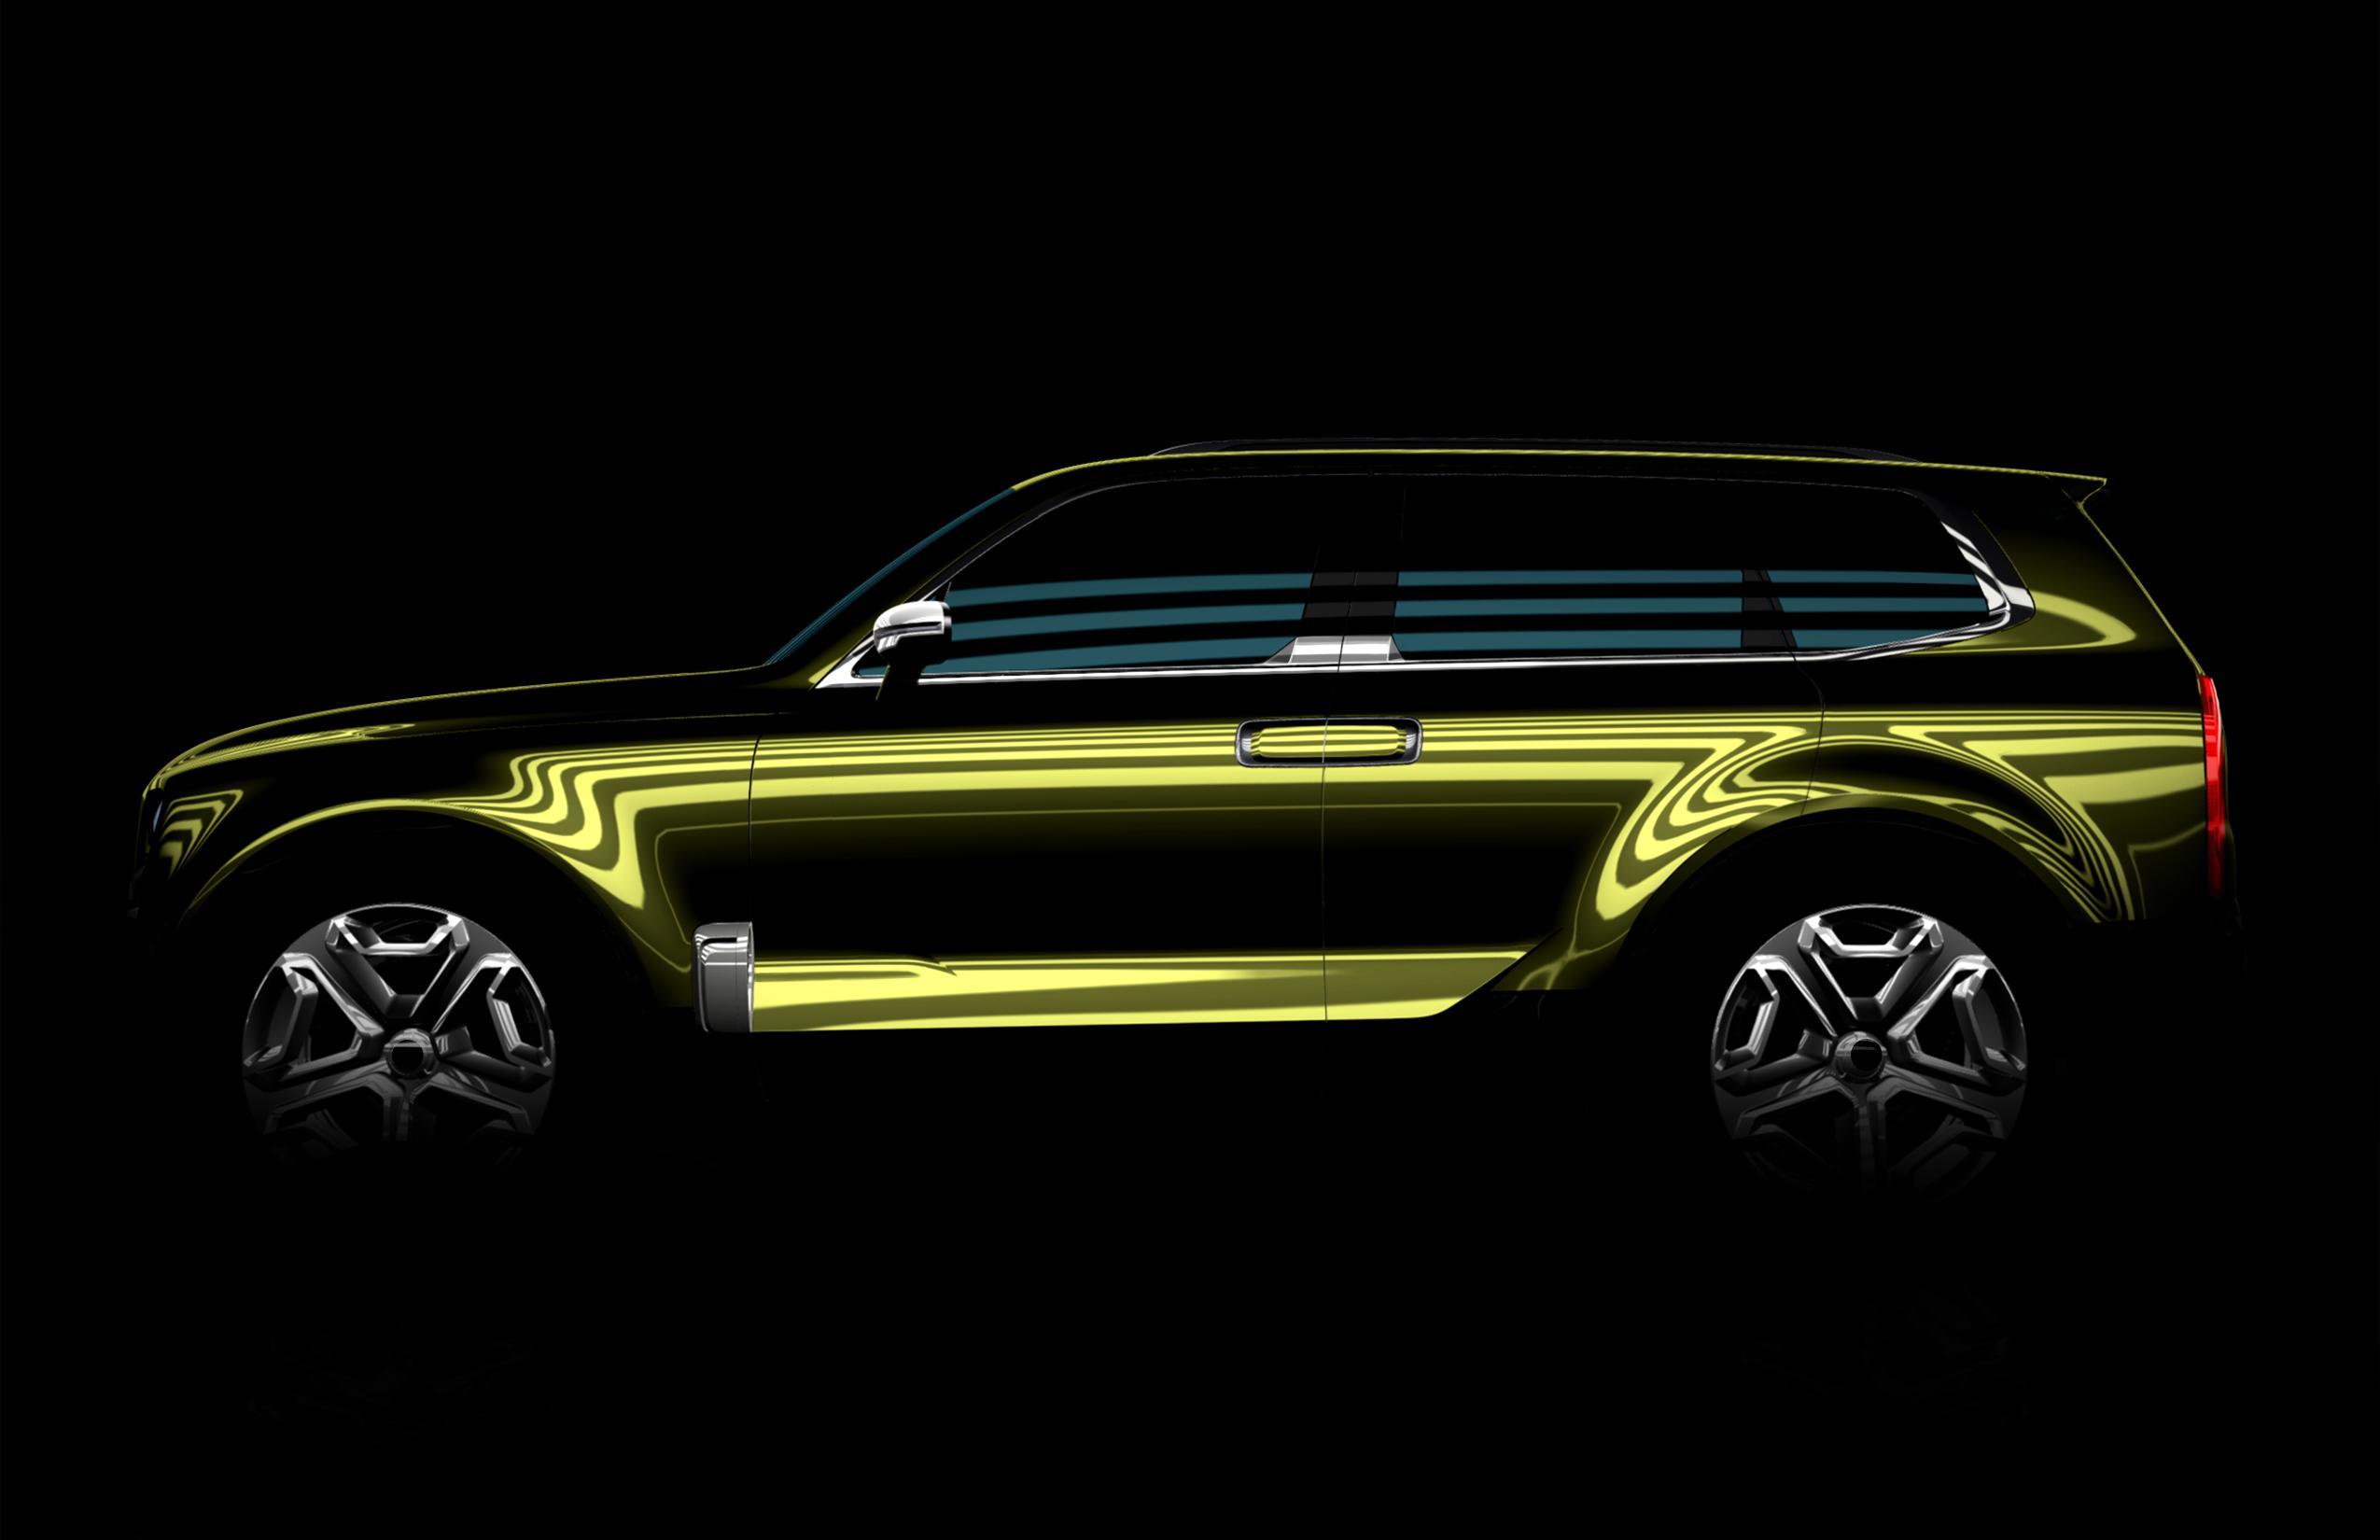 new car 2016 suvKia Teases New SUV Concept for 2016 Detroit Auto Show  autoevolution